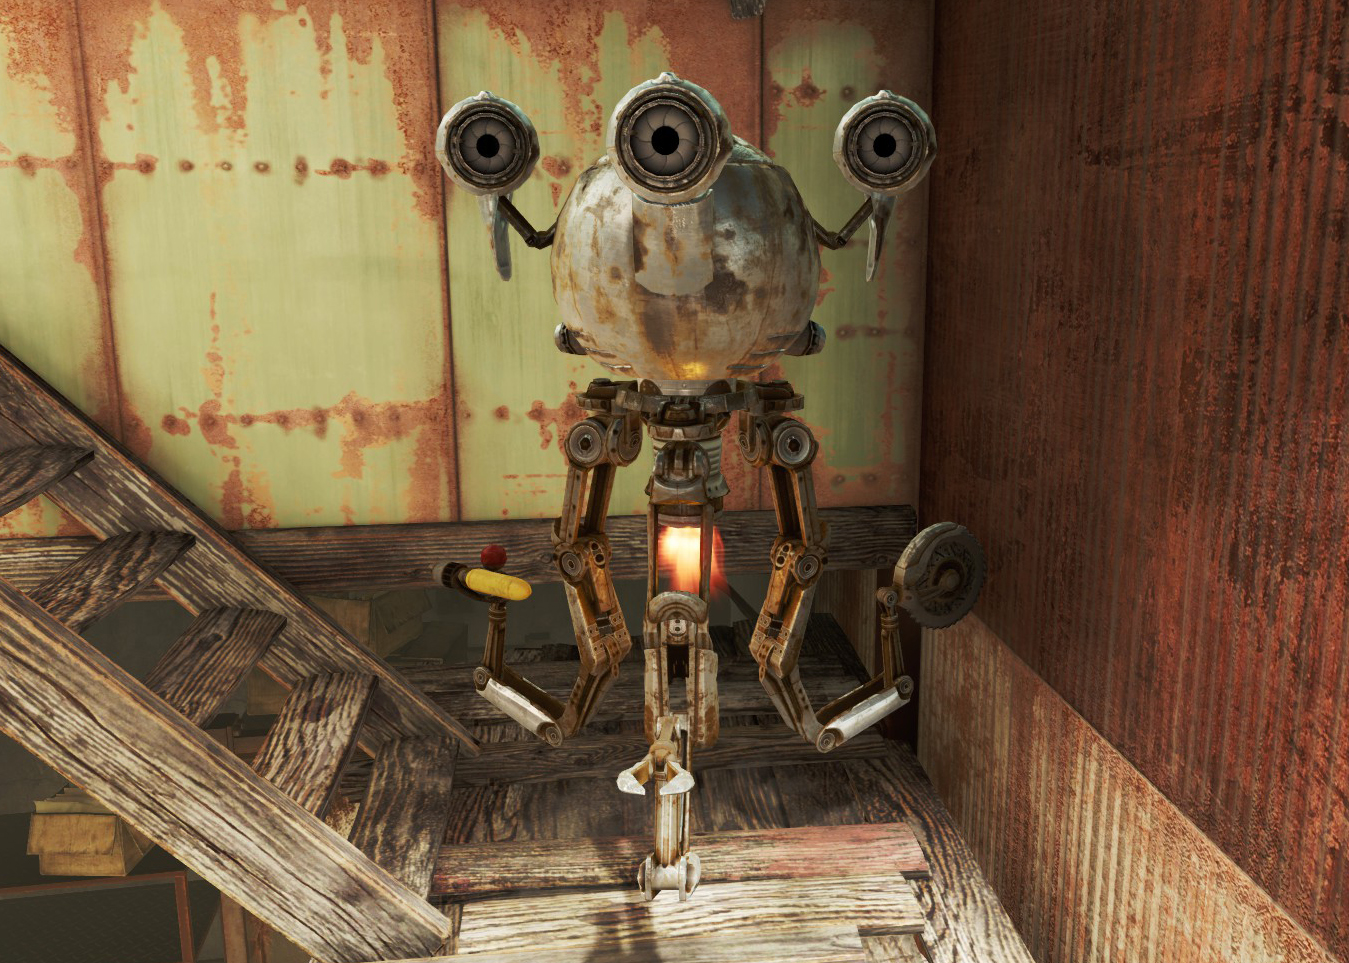 Percy (Fallout 4)